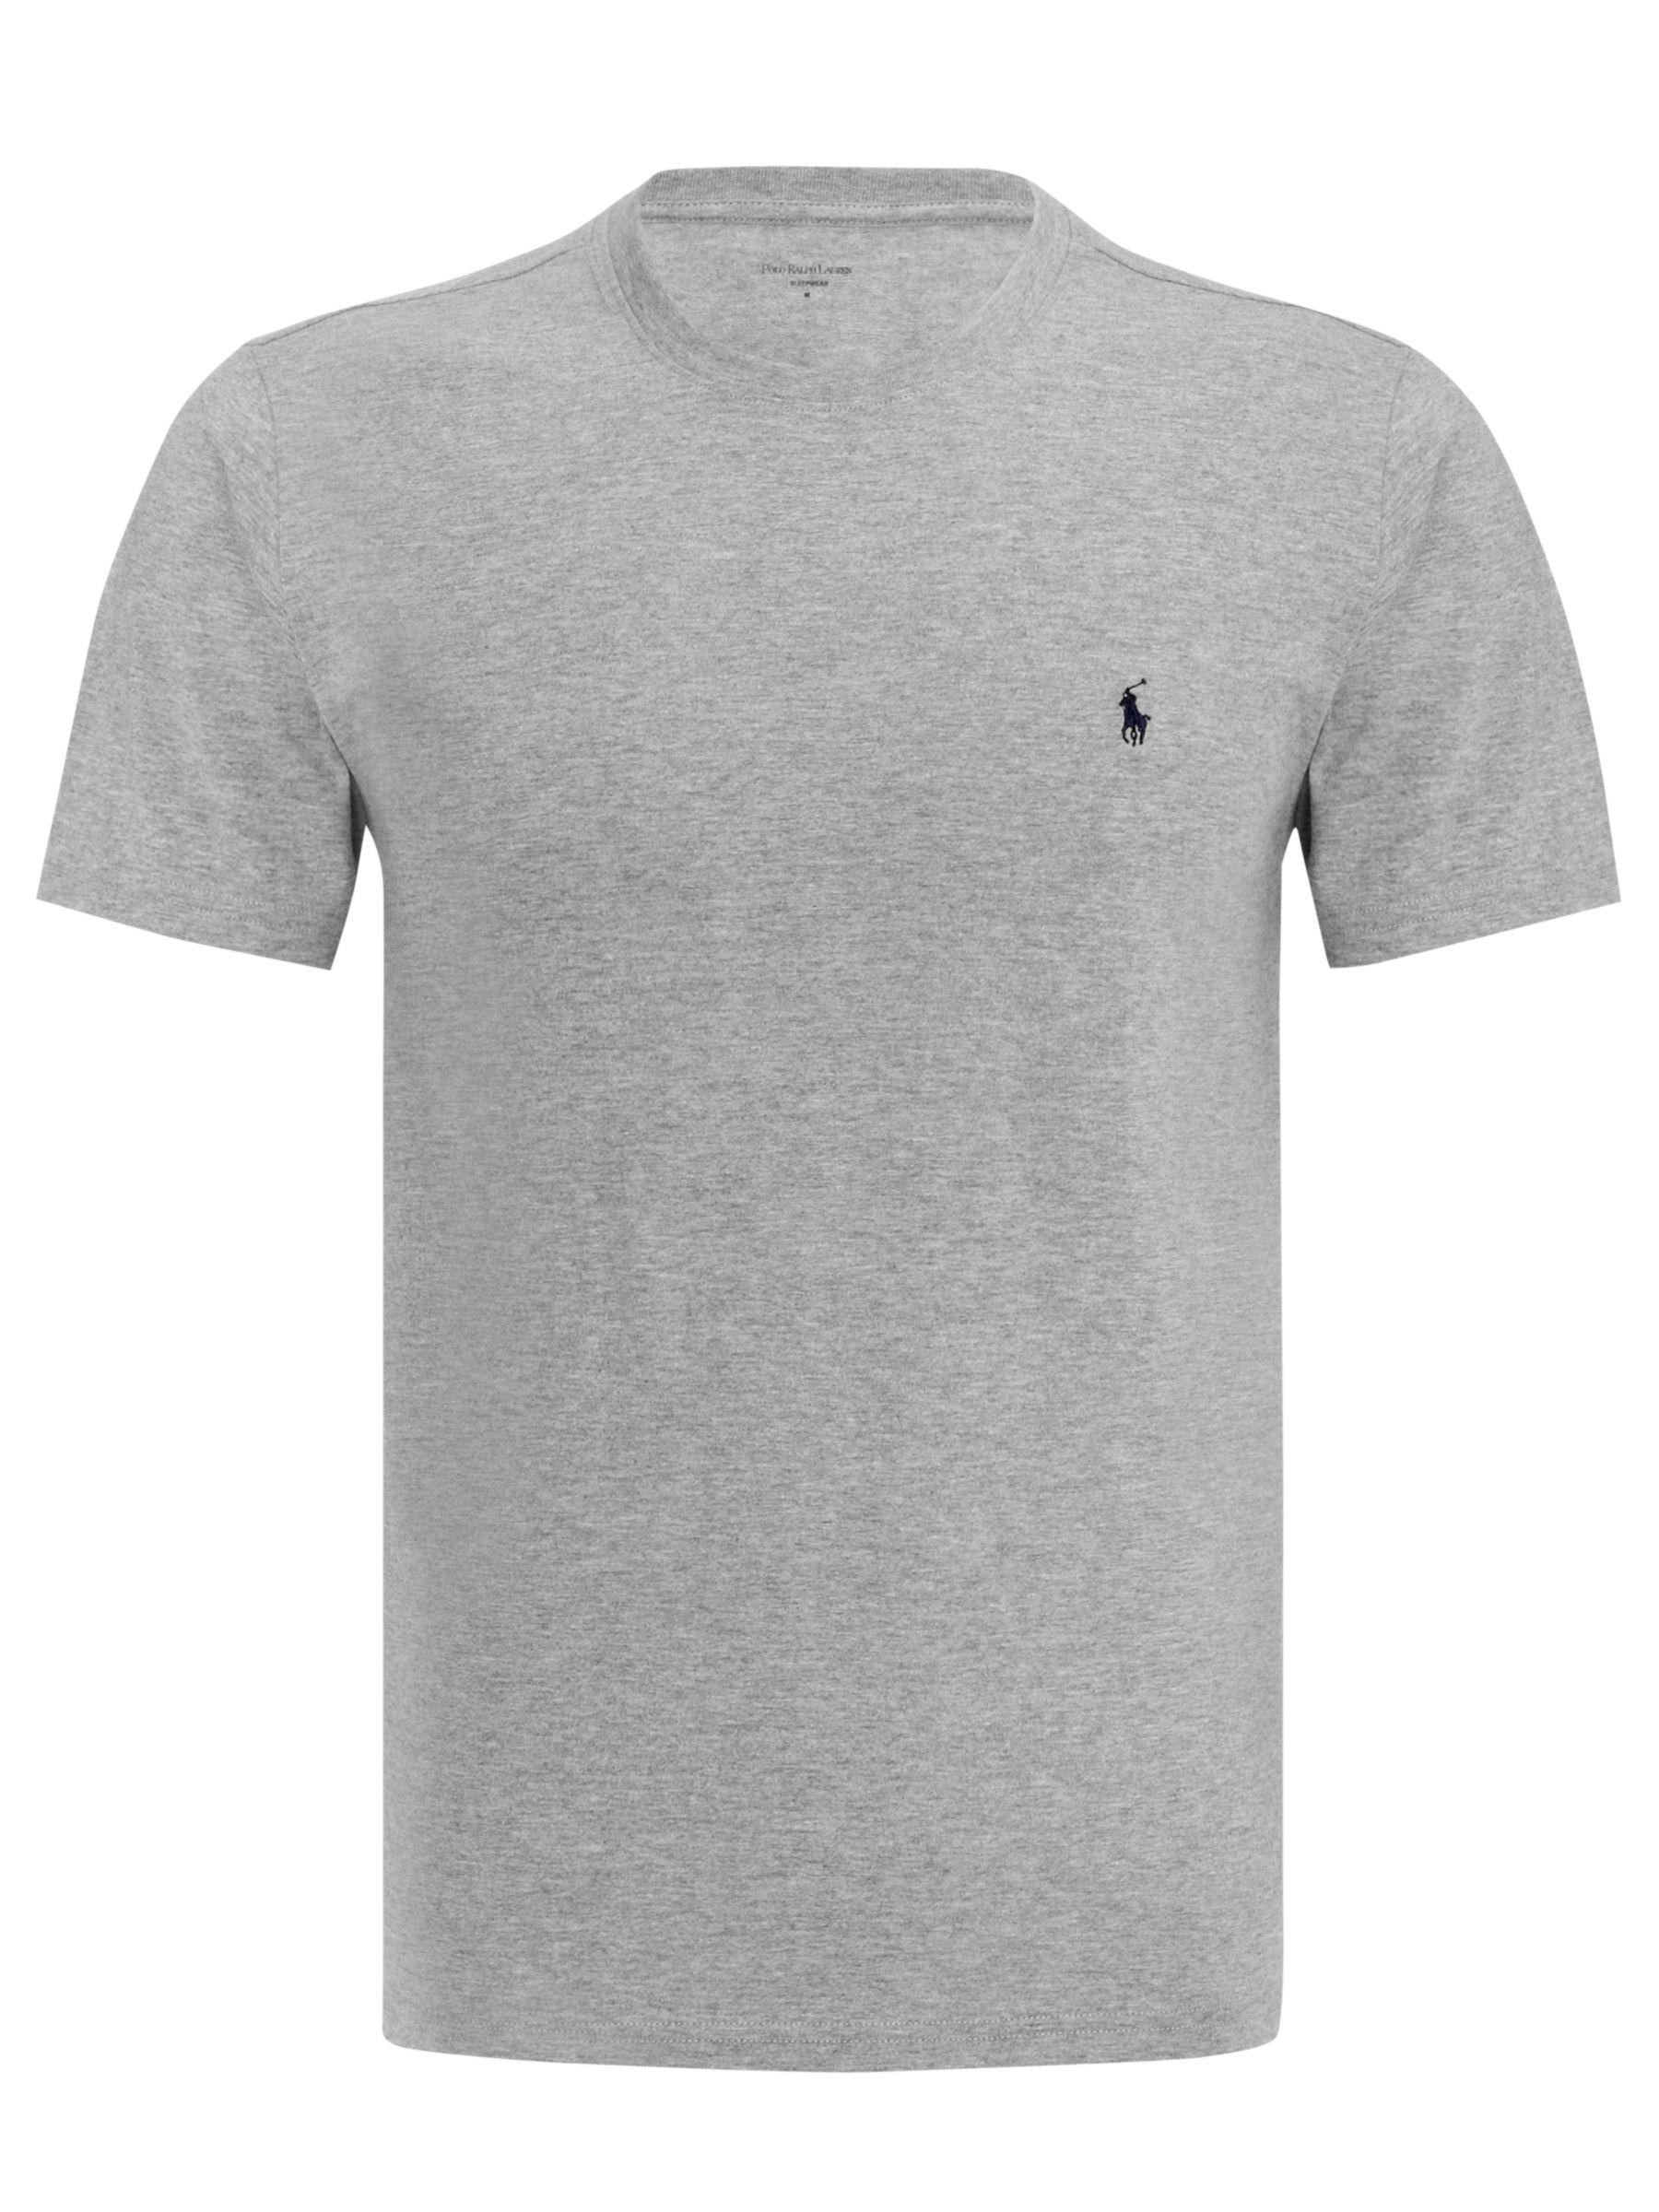 Polo Ralph Lauren Crew Neck Lounge T-Shirt, Grey